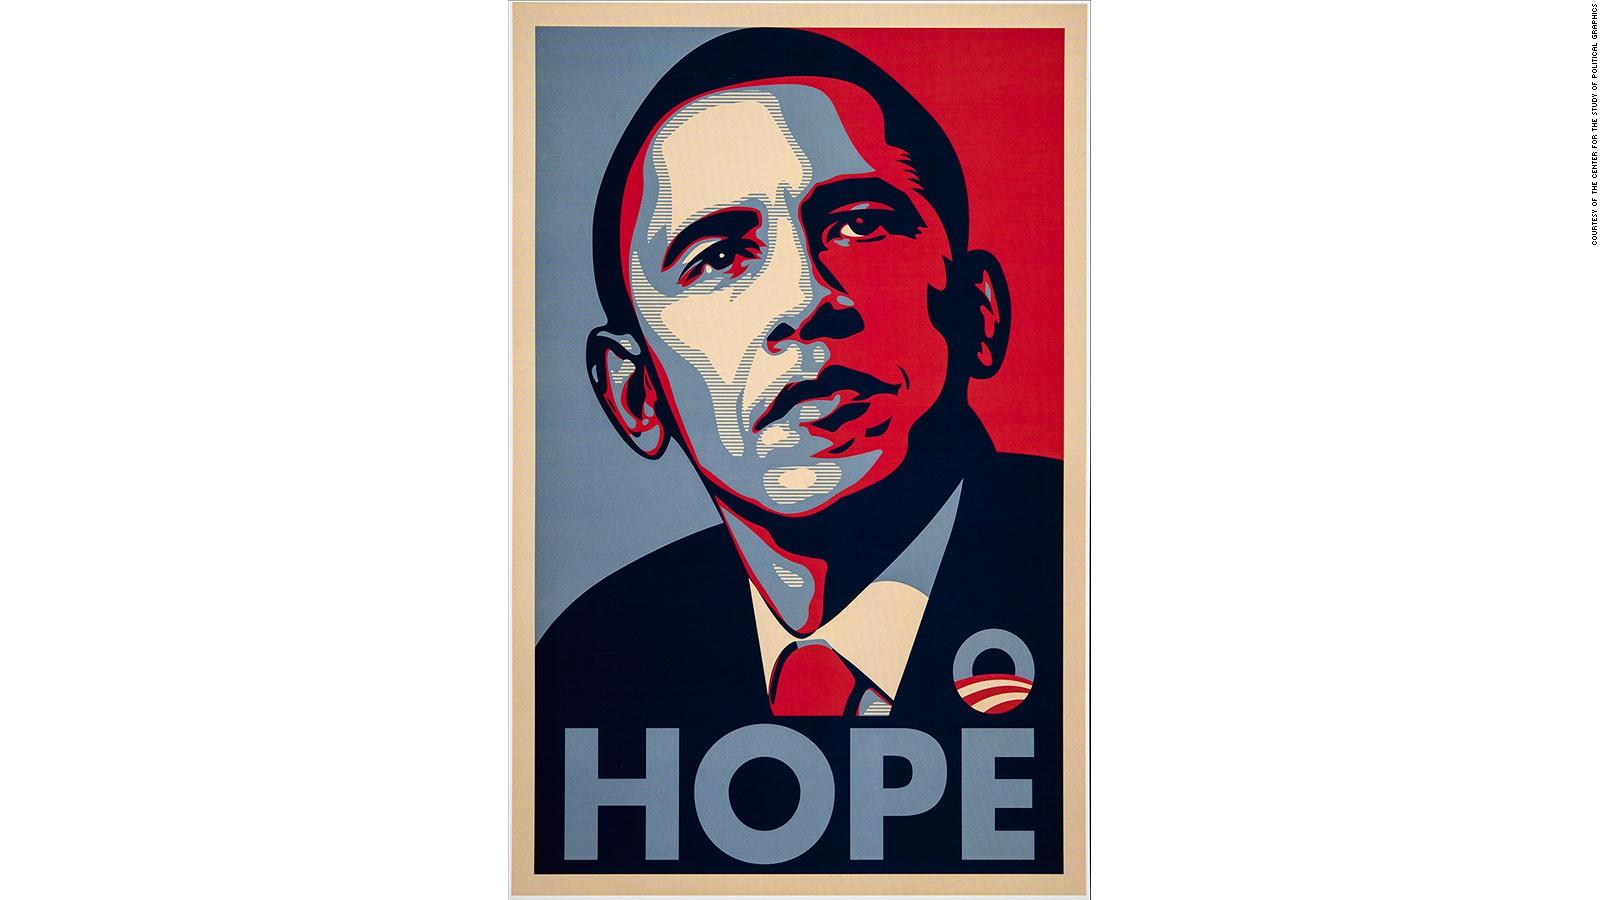 161019173457-hope-by-shepard-fairey-full-169